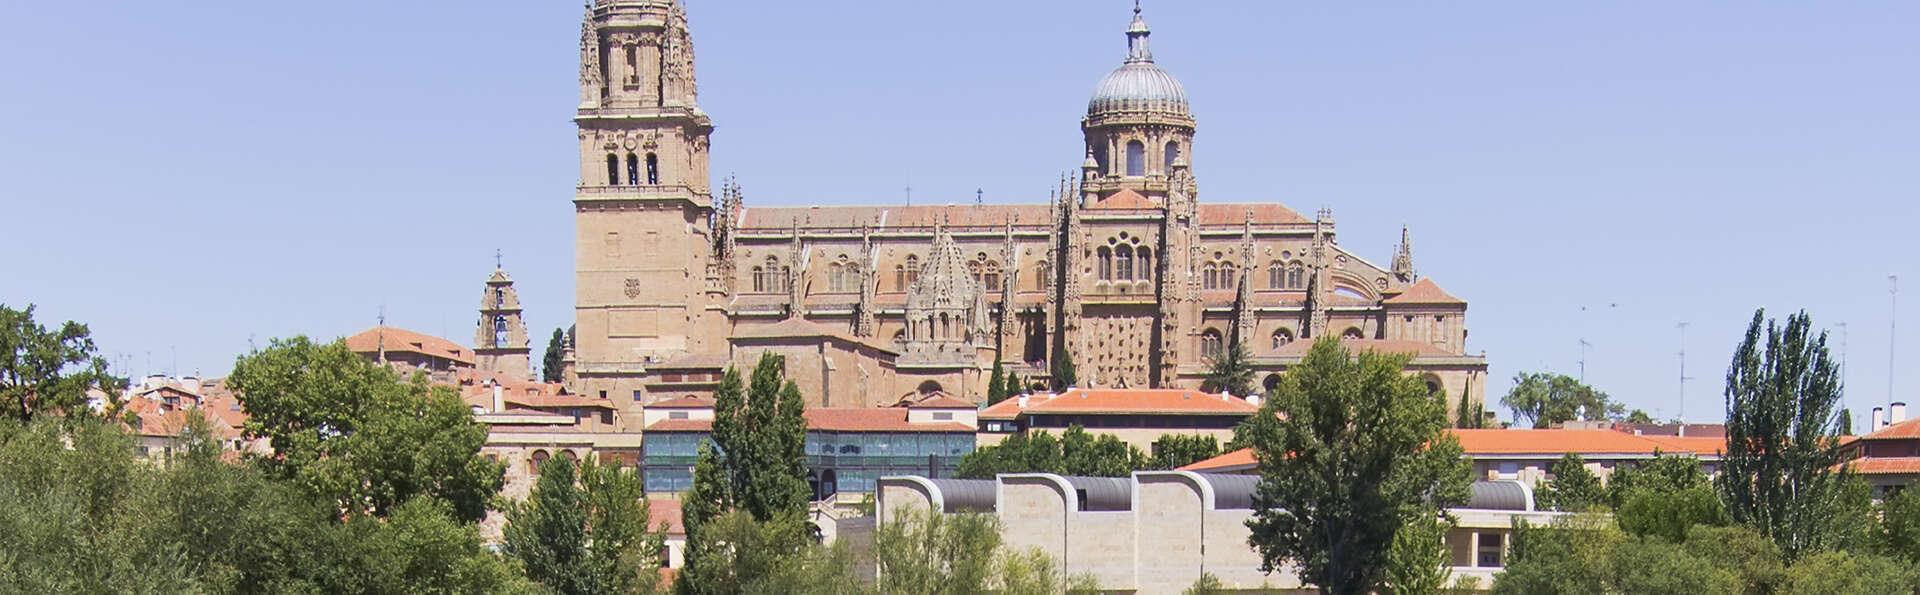 Hotel Sercotel Horus Salamanca - EDIT_NEW_DESTINATION2.jpg